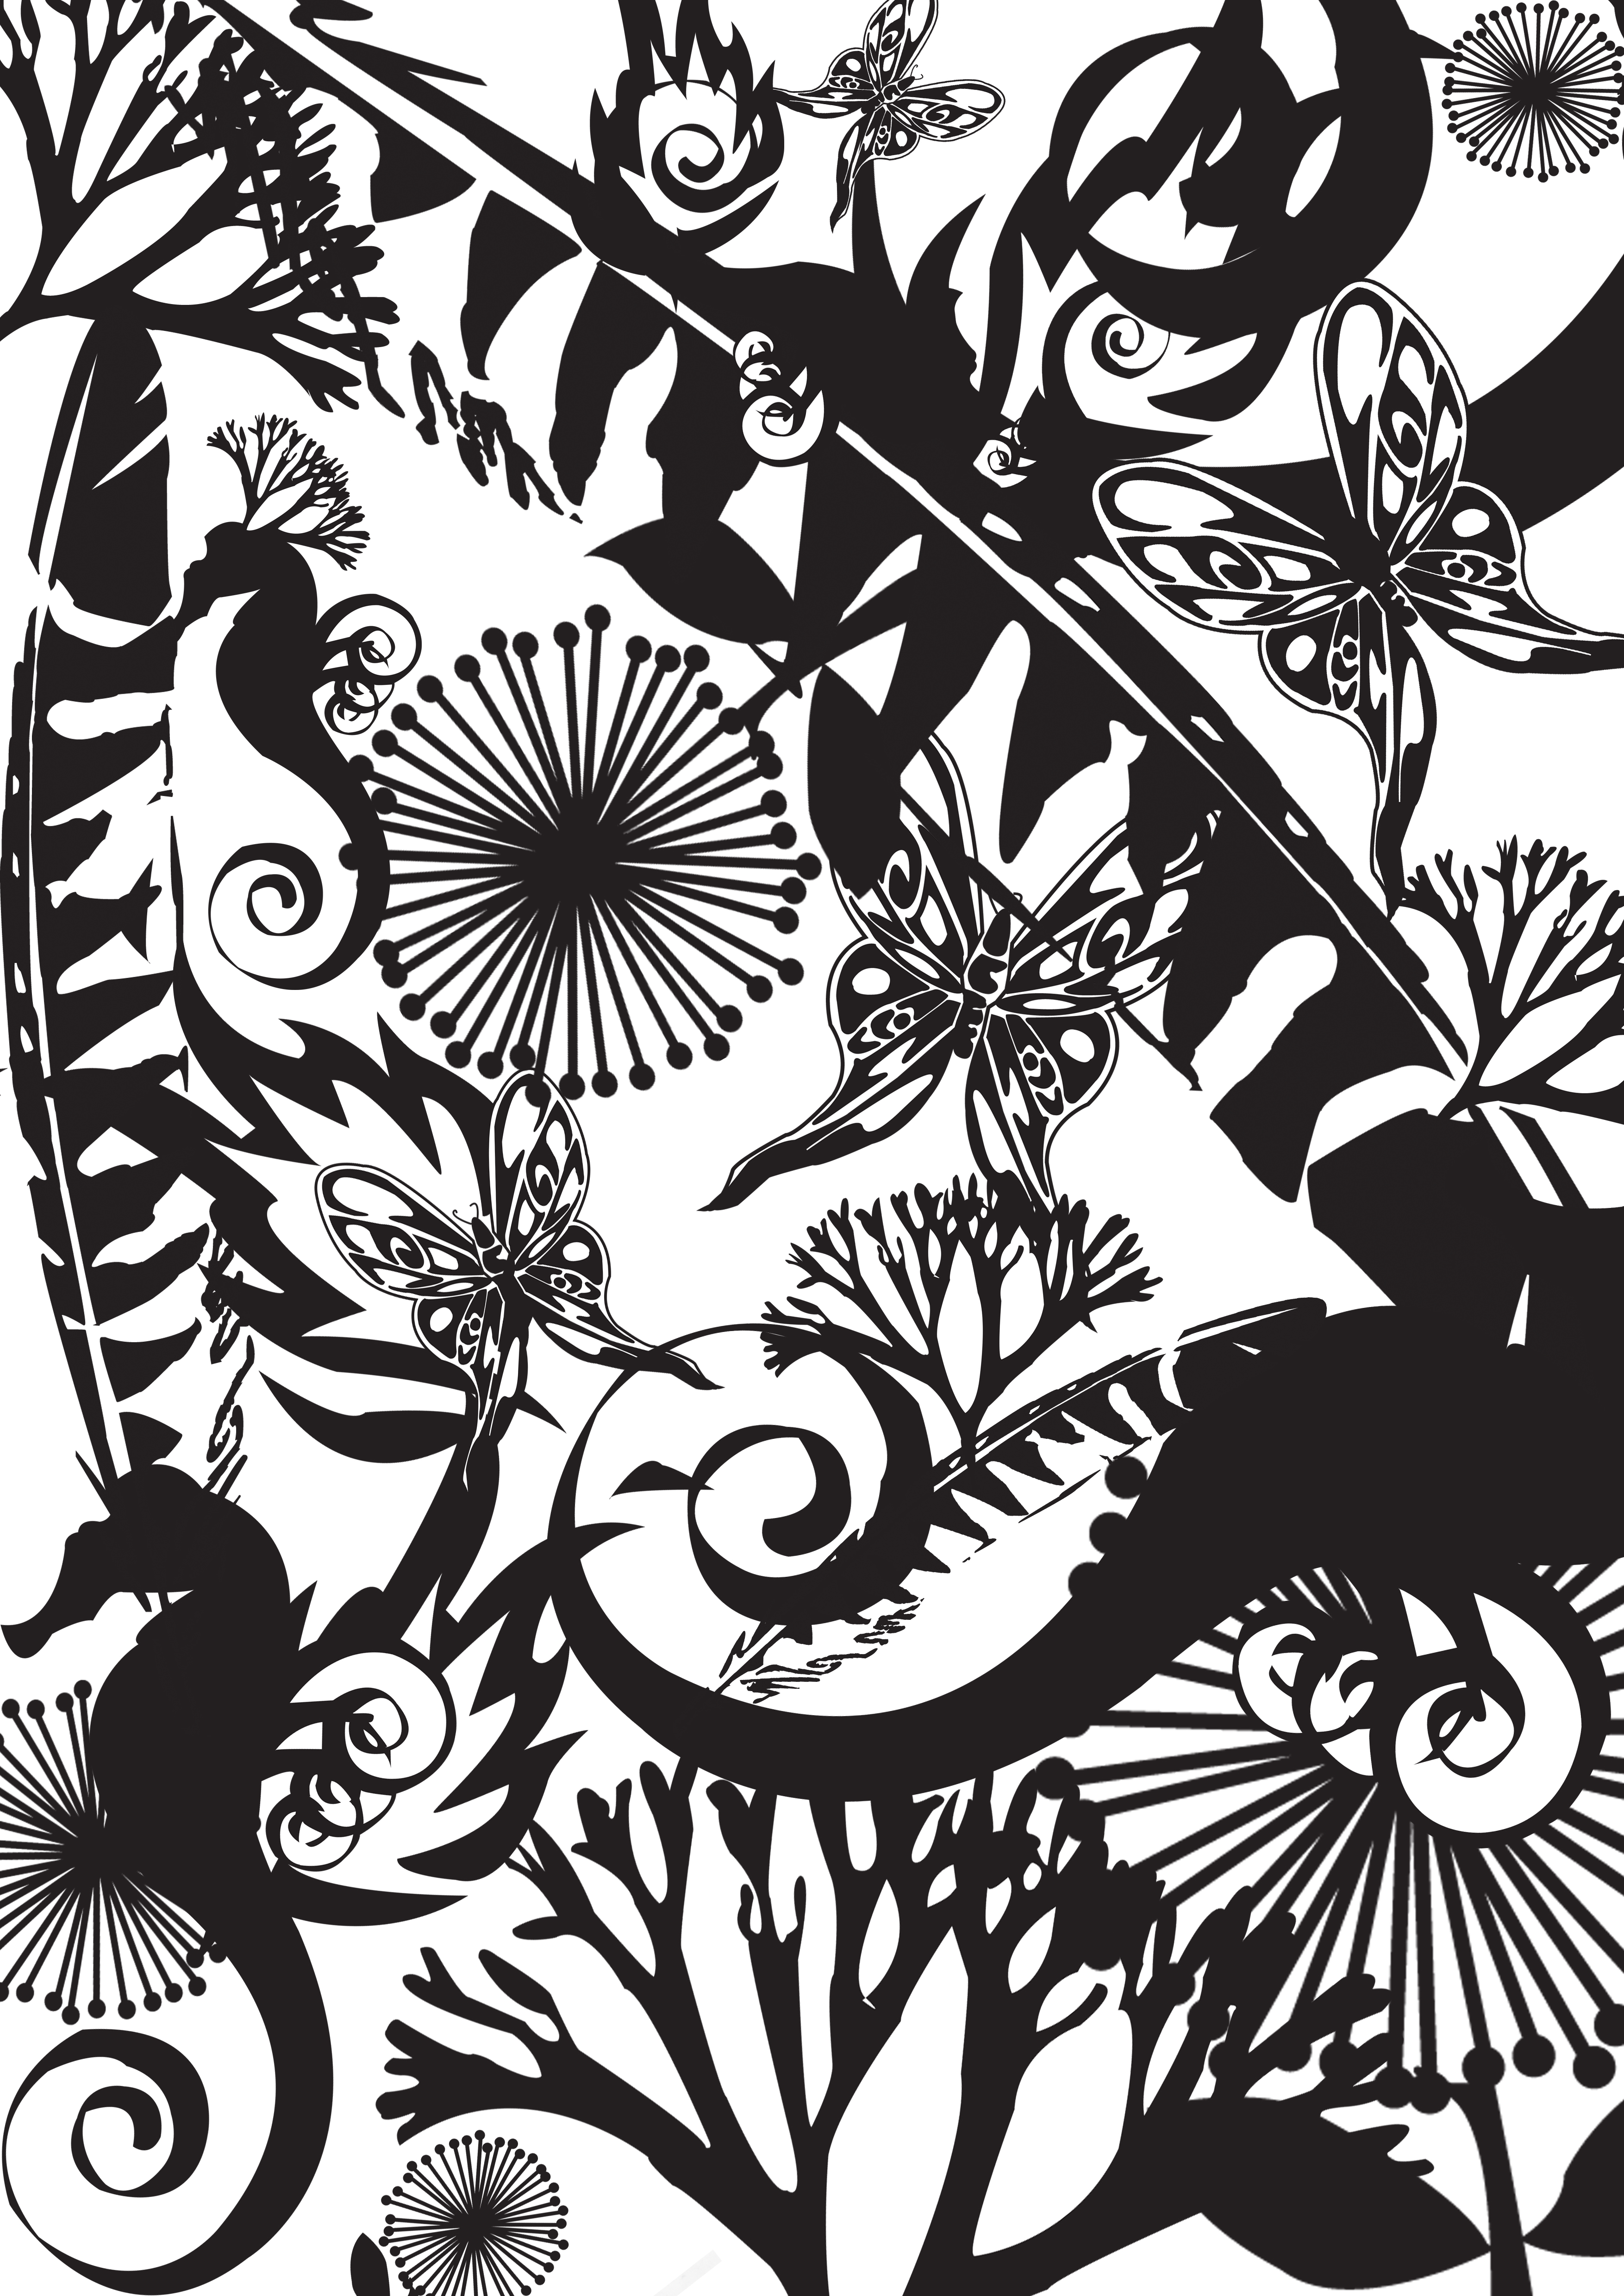 Drawn nature – creative Adobe Patterns pen